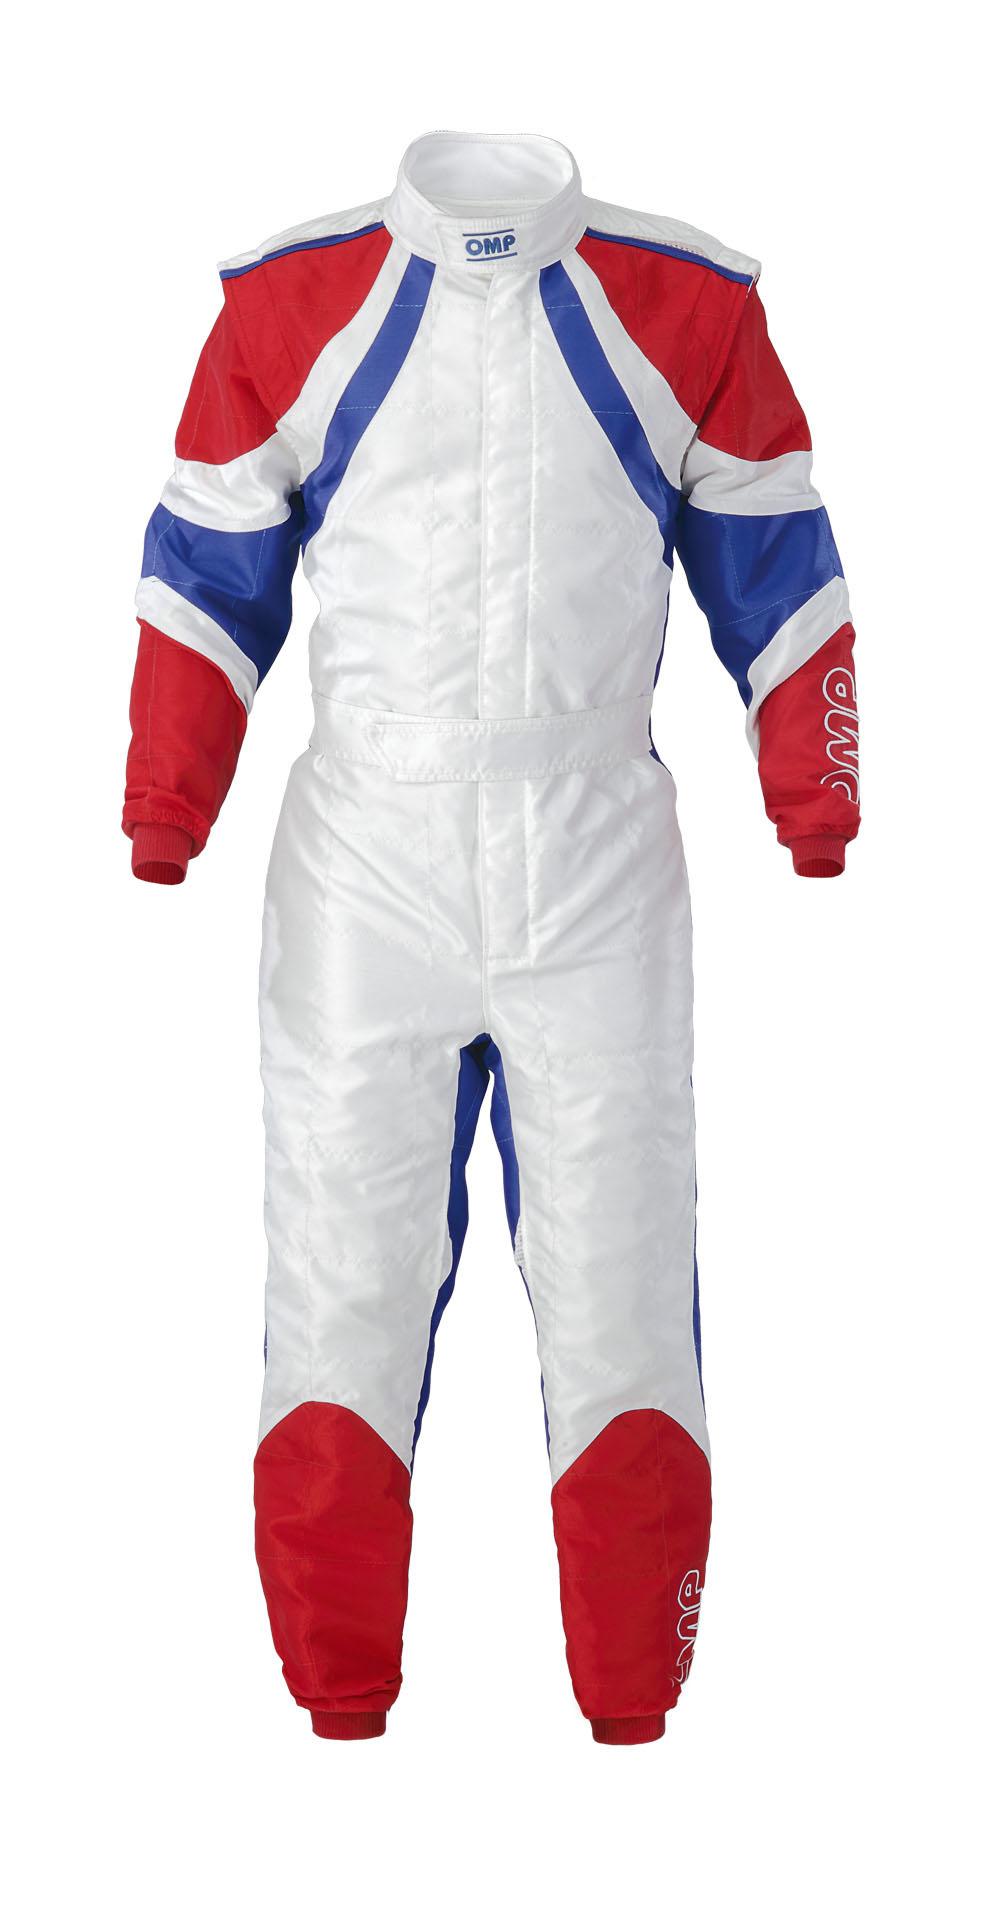 Kk01713 Omp Slash Kart Suit Cik Fia Size 56 White Blue Red